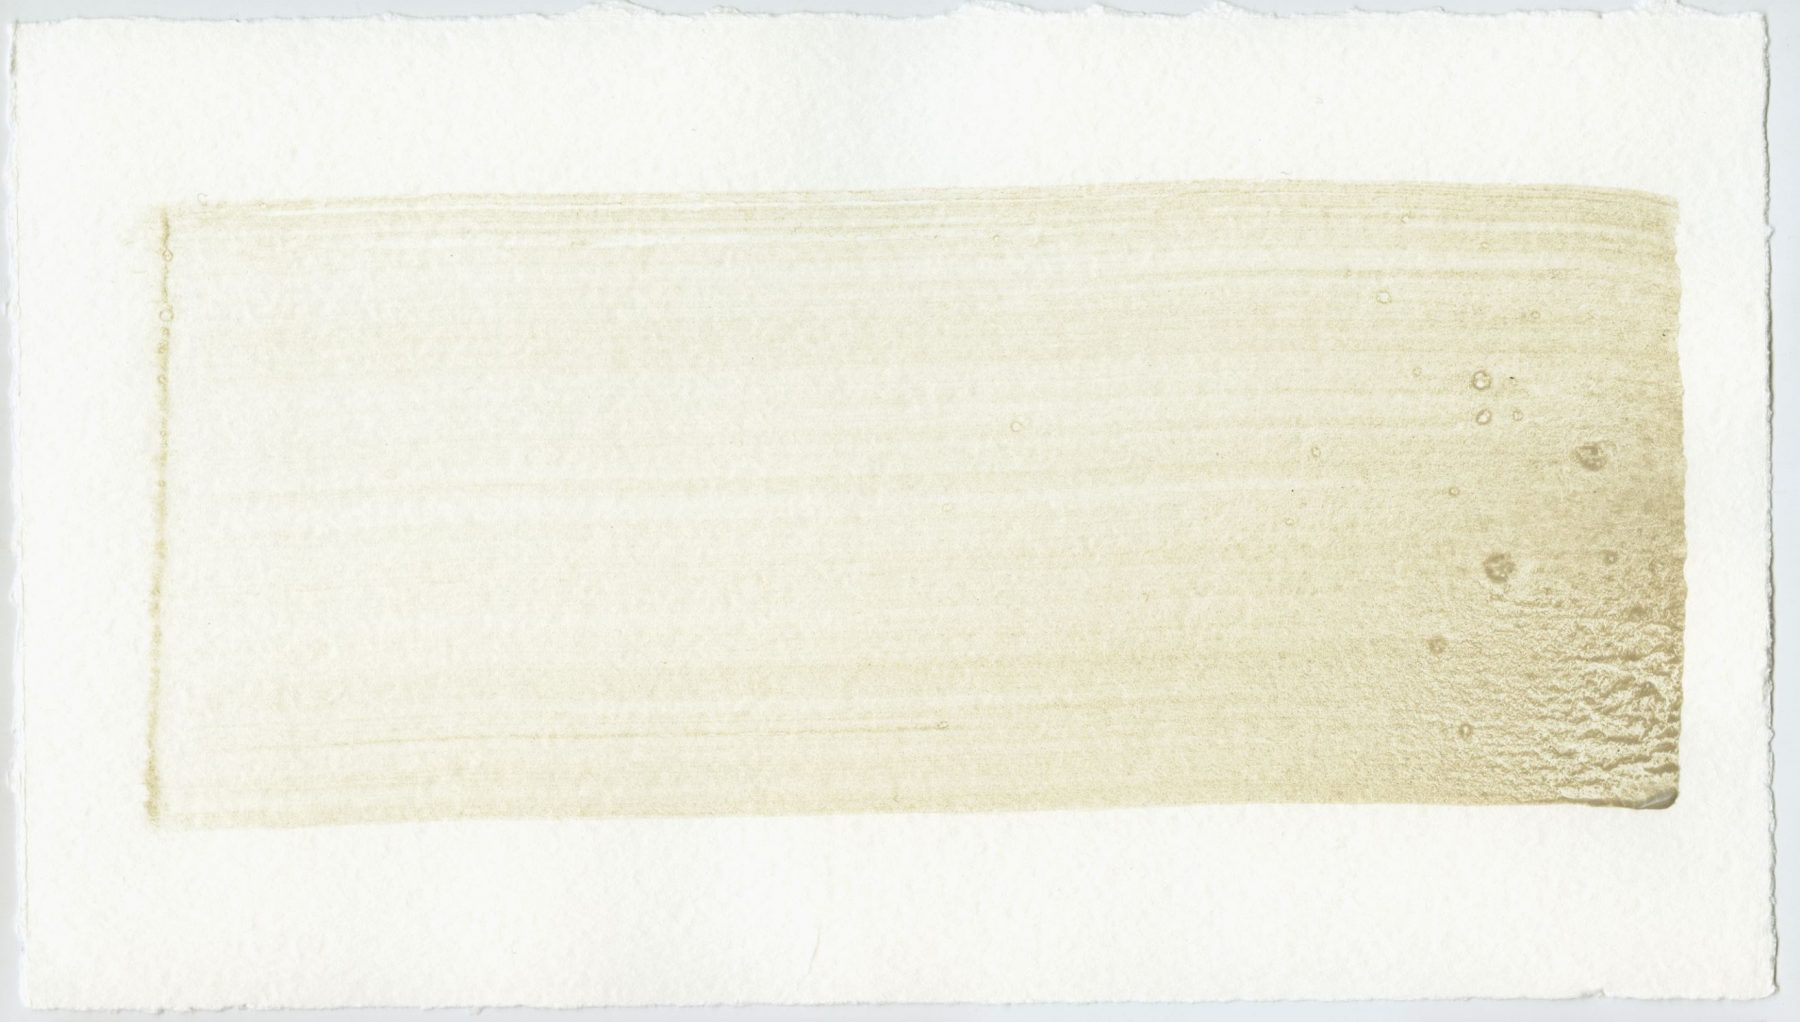 Brush stroke no. 95 - Selfmade pigment: Perekker grijs gebrand